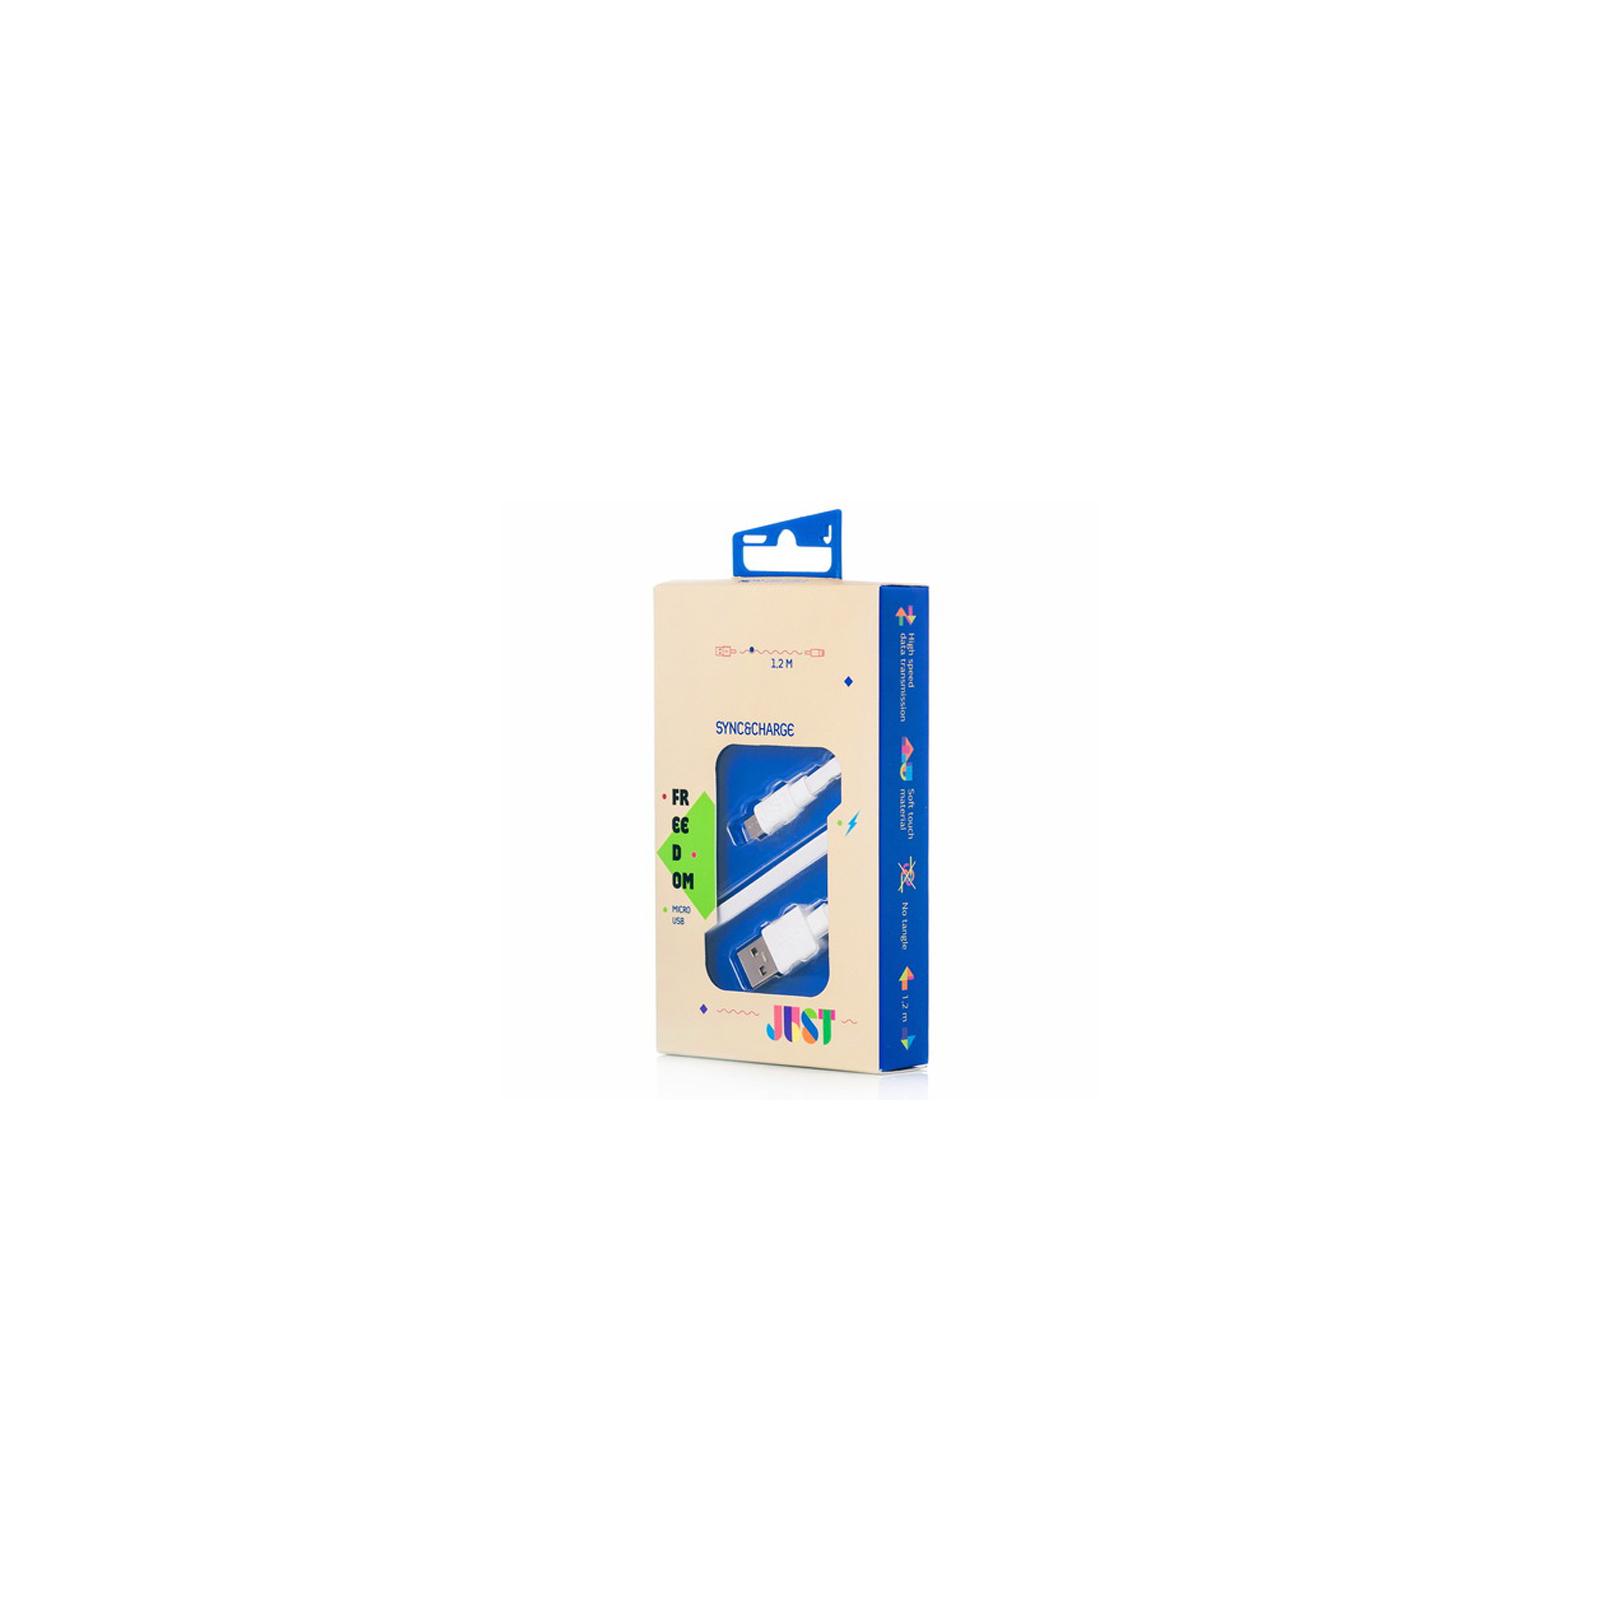 Дата кабель JUST Freedom Micro USB Cable White (MCR-FRDM-WHT) изображение 3